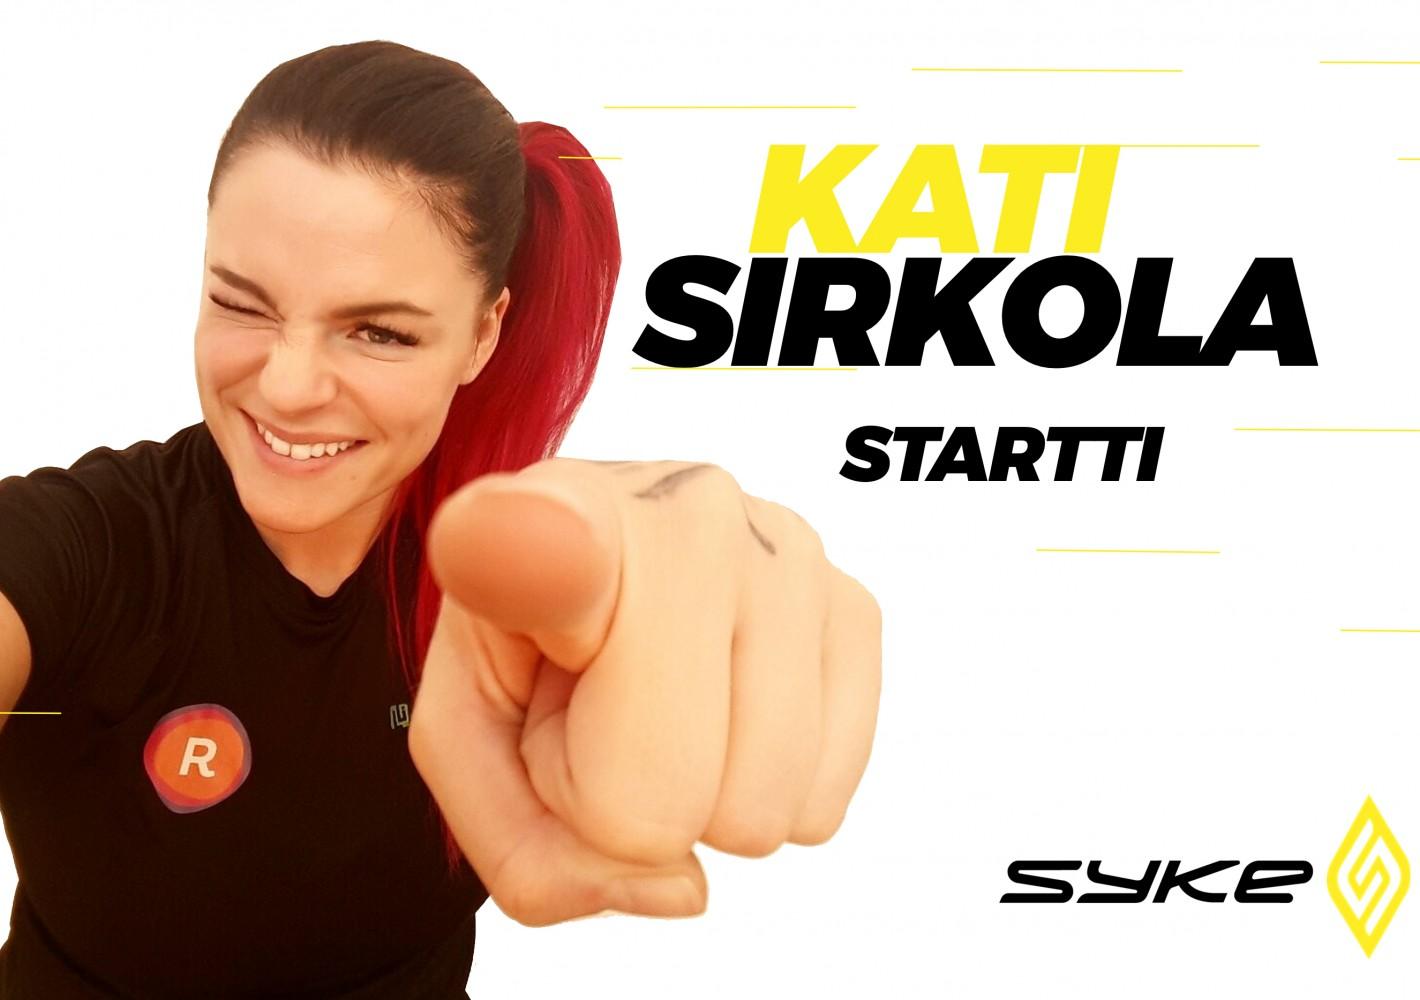 Startti by Kati Sirkola